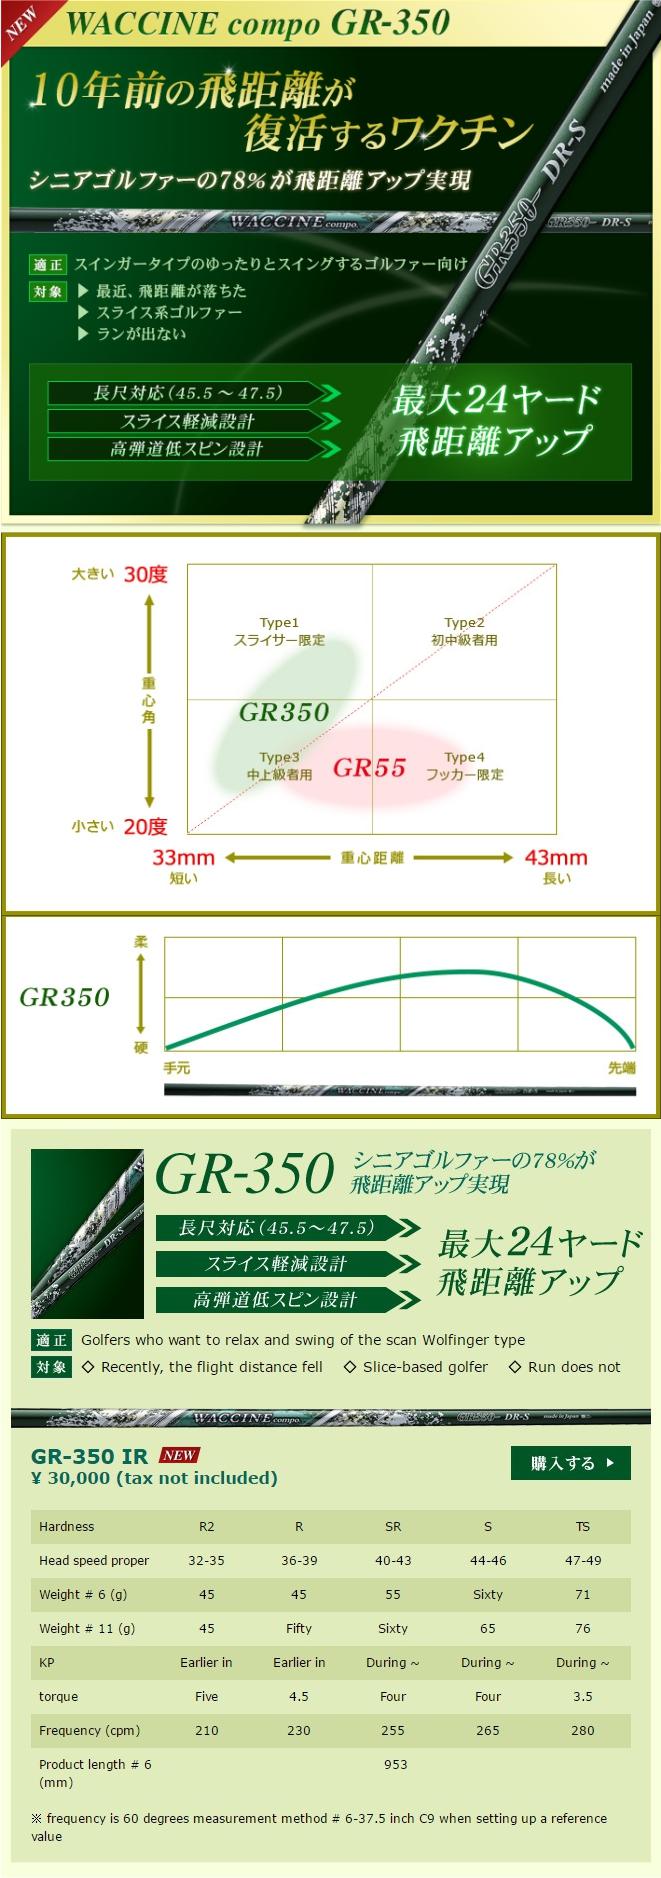 Waccine Compo GR-350 Iron Shafts